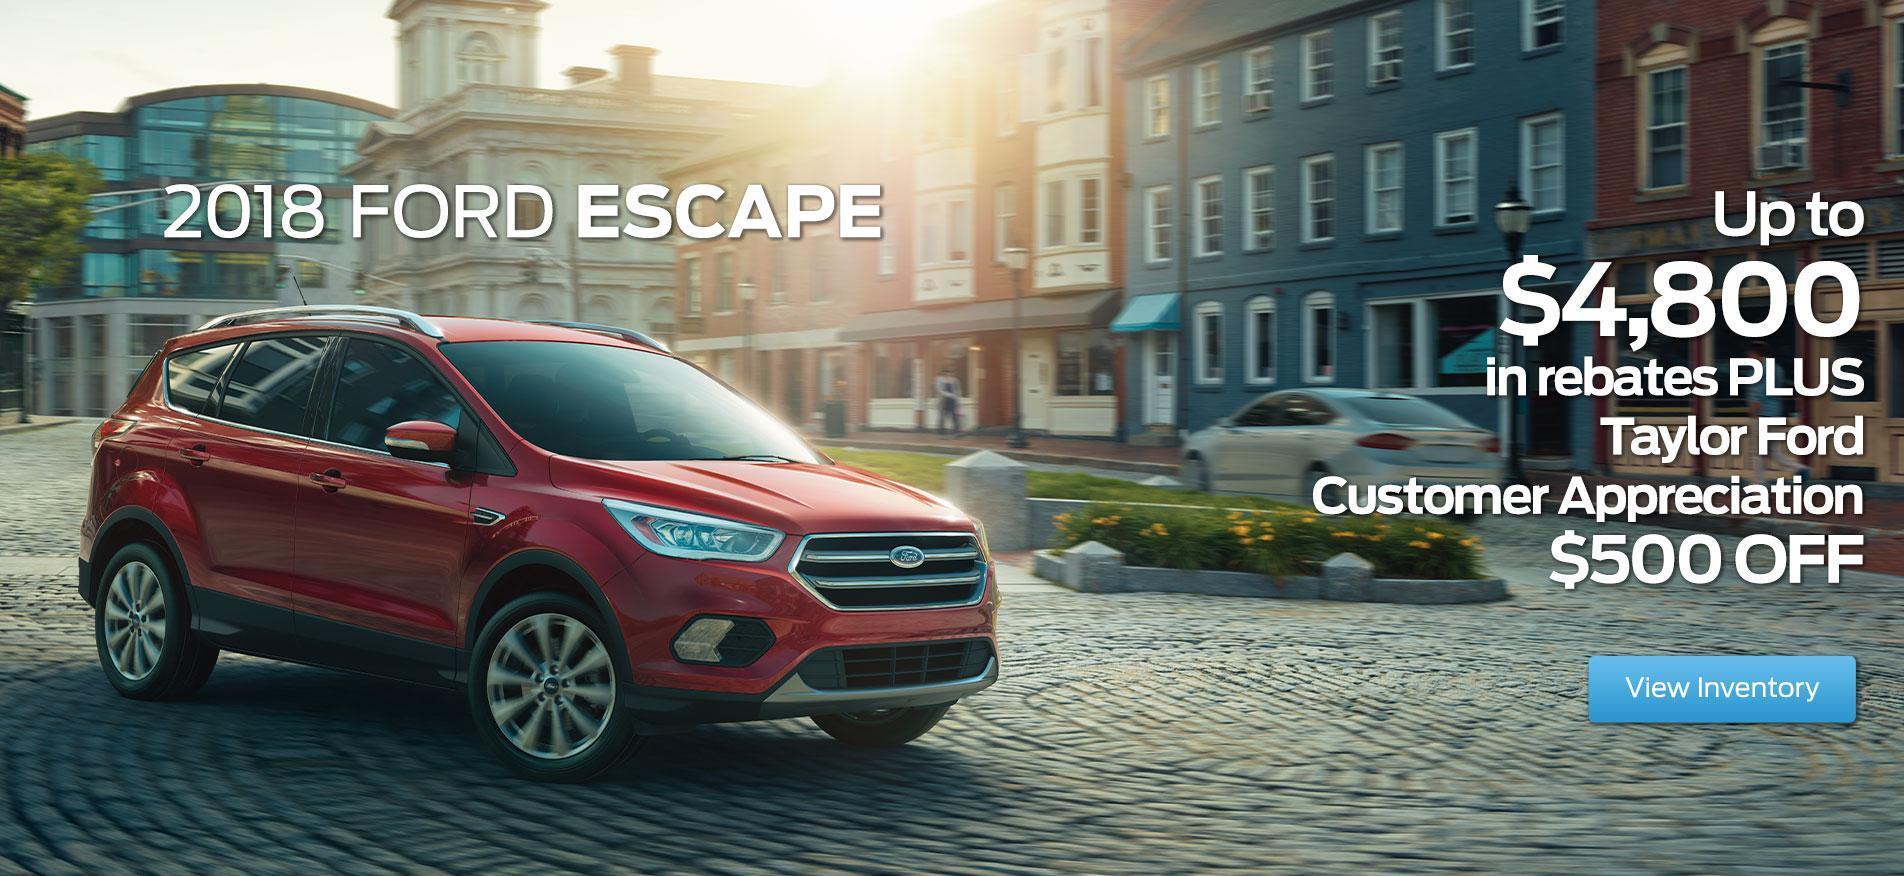 2018 Ford Escape Red